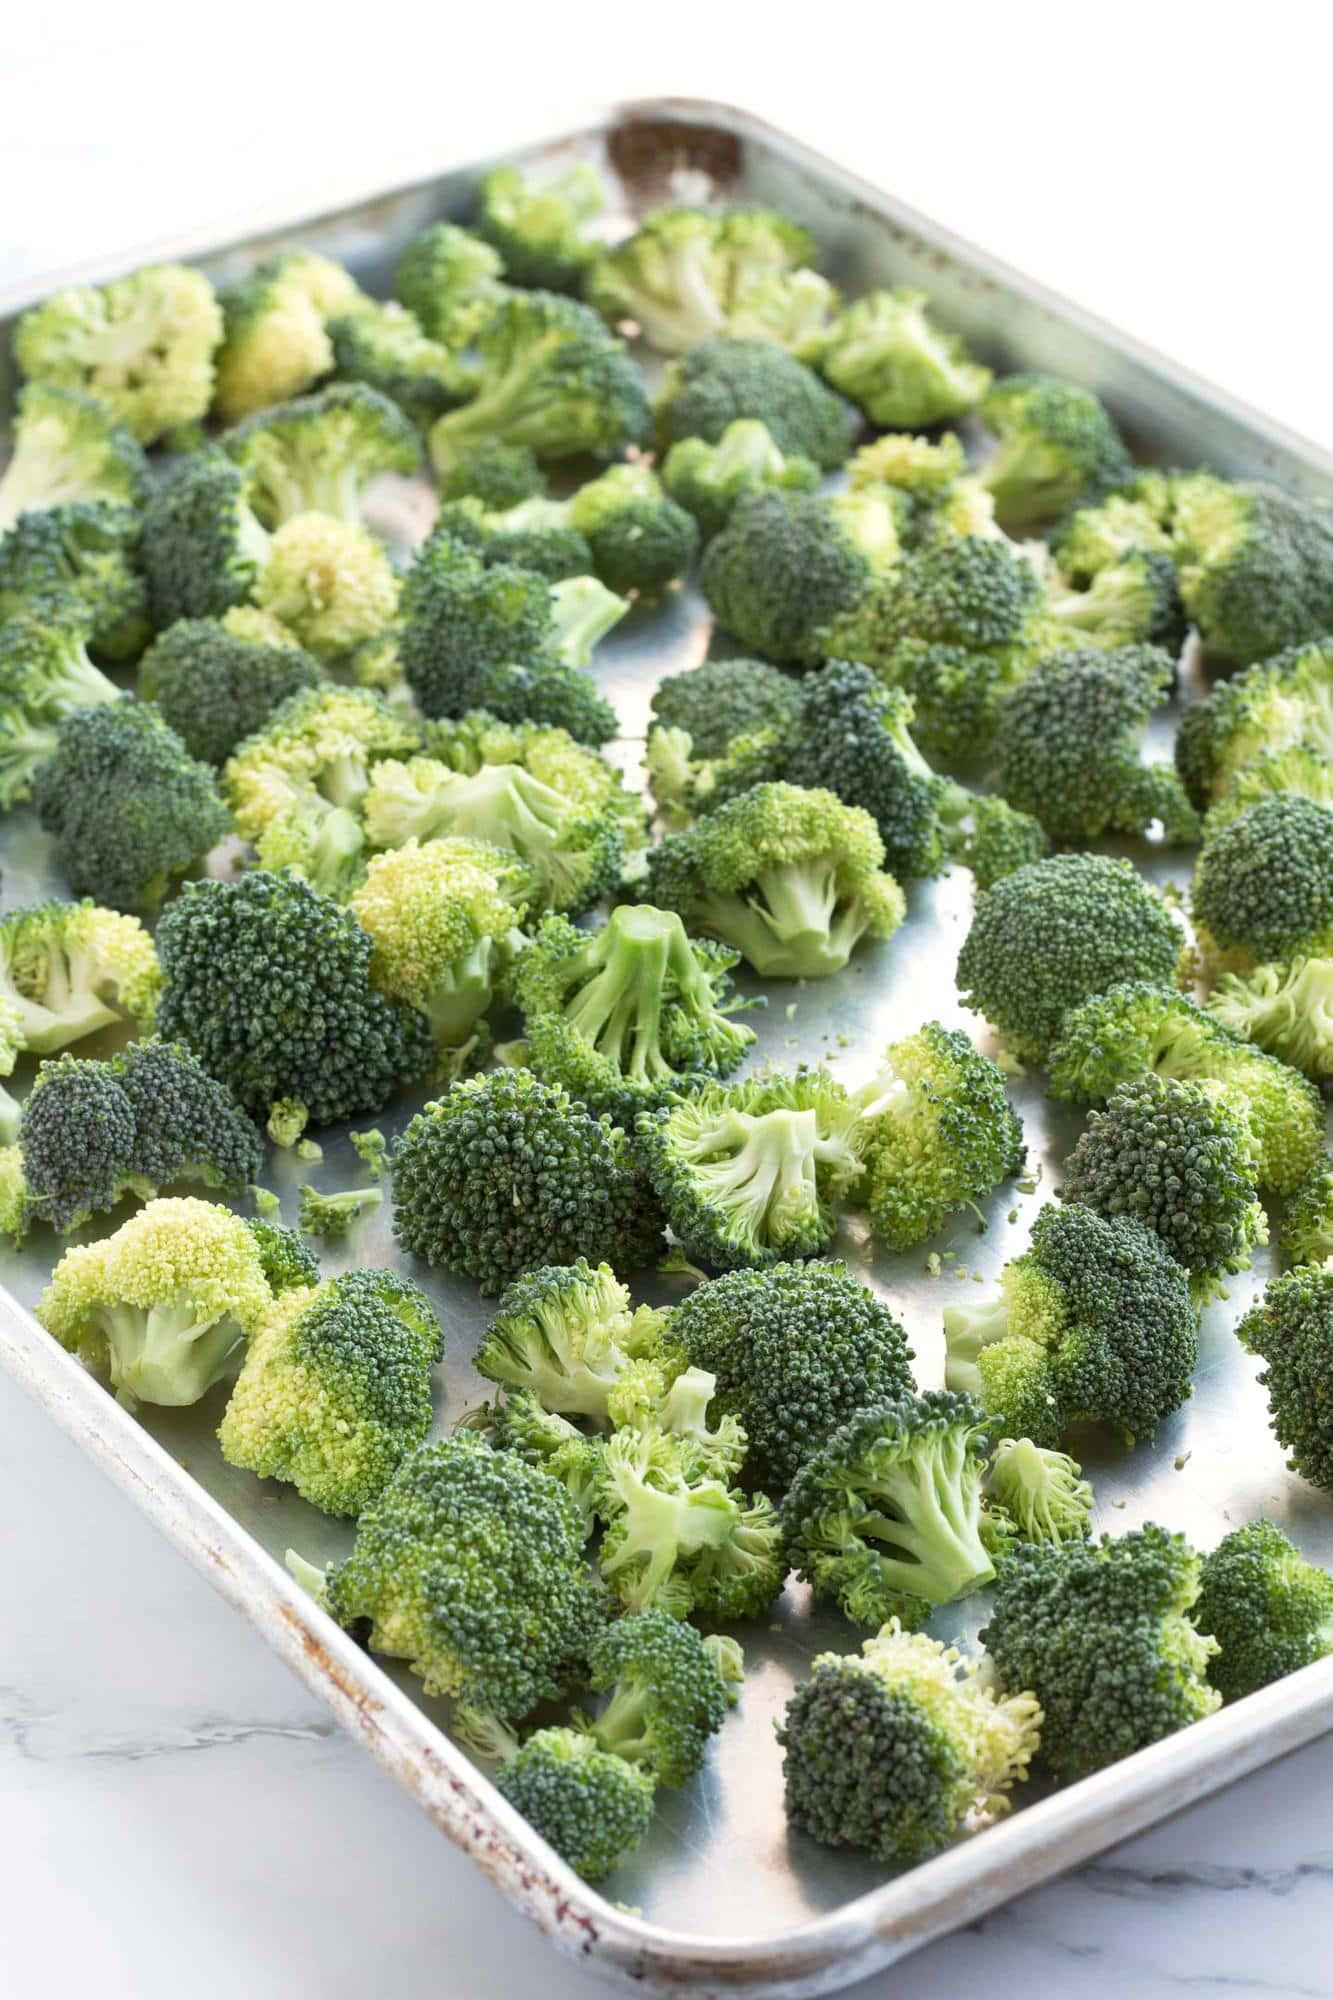 Raw broccoli on sheet pan